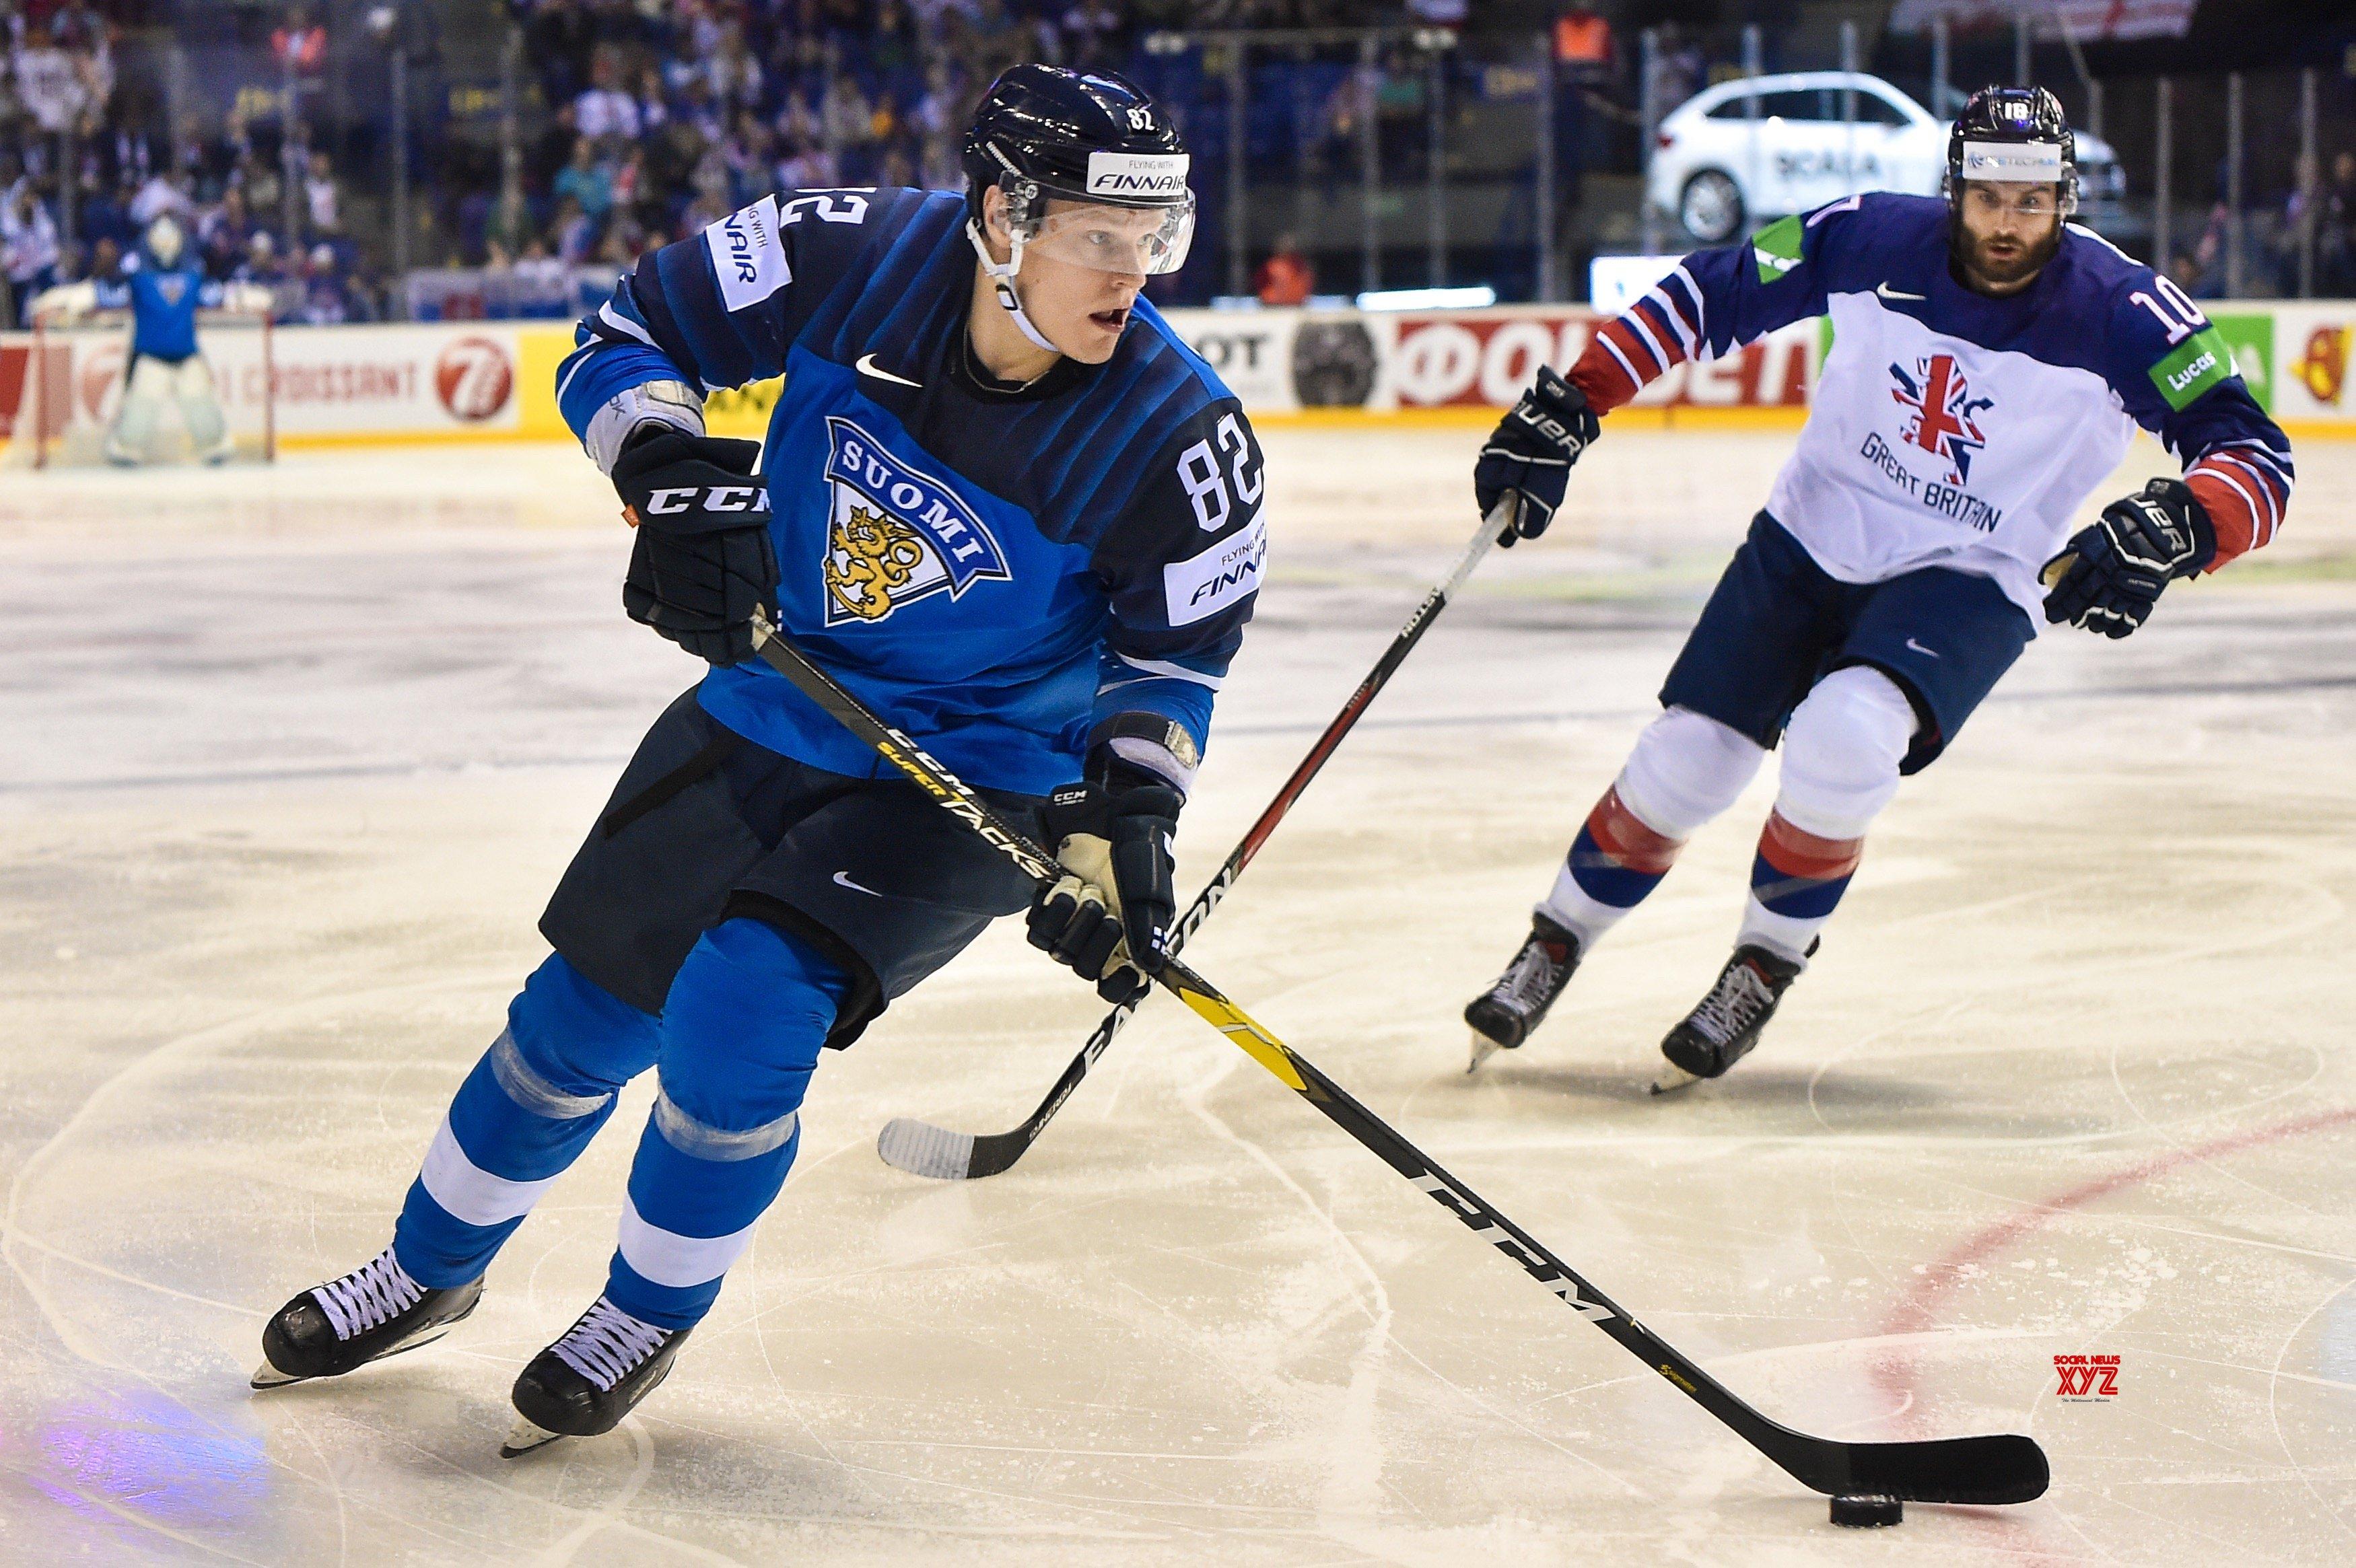 SLOVAKIA - KOSICE - ICE HOCKEY - IIHF - WORLD CHAMPIONSHIP - GROUP A - FIN VS GBR #Gallery